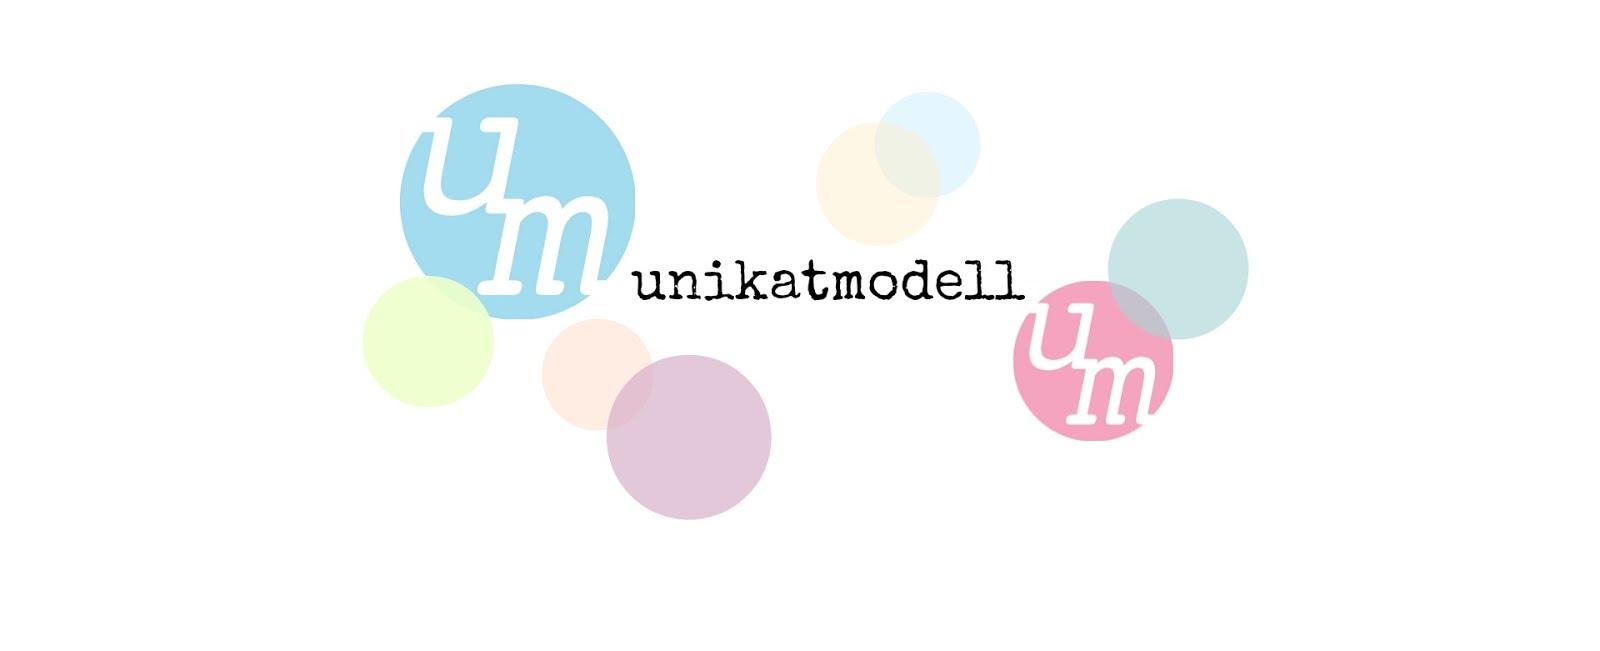 unikatmodell